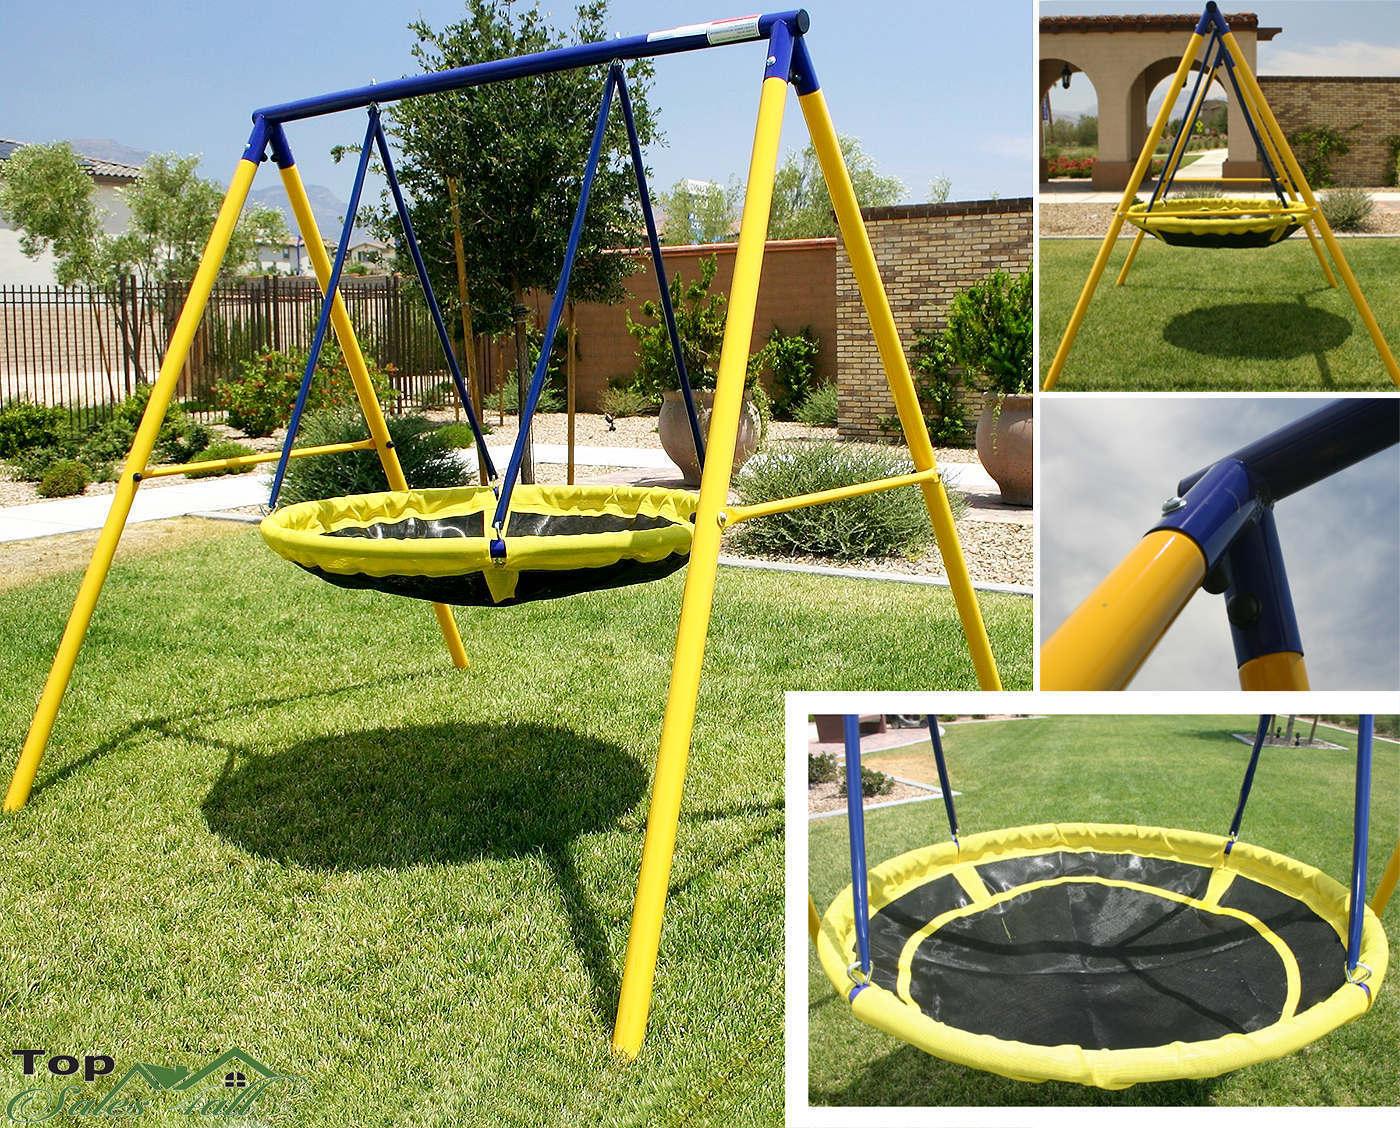 swing sets for backyard playground children round yard kids